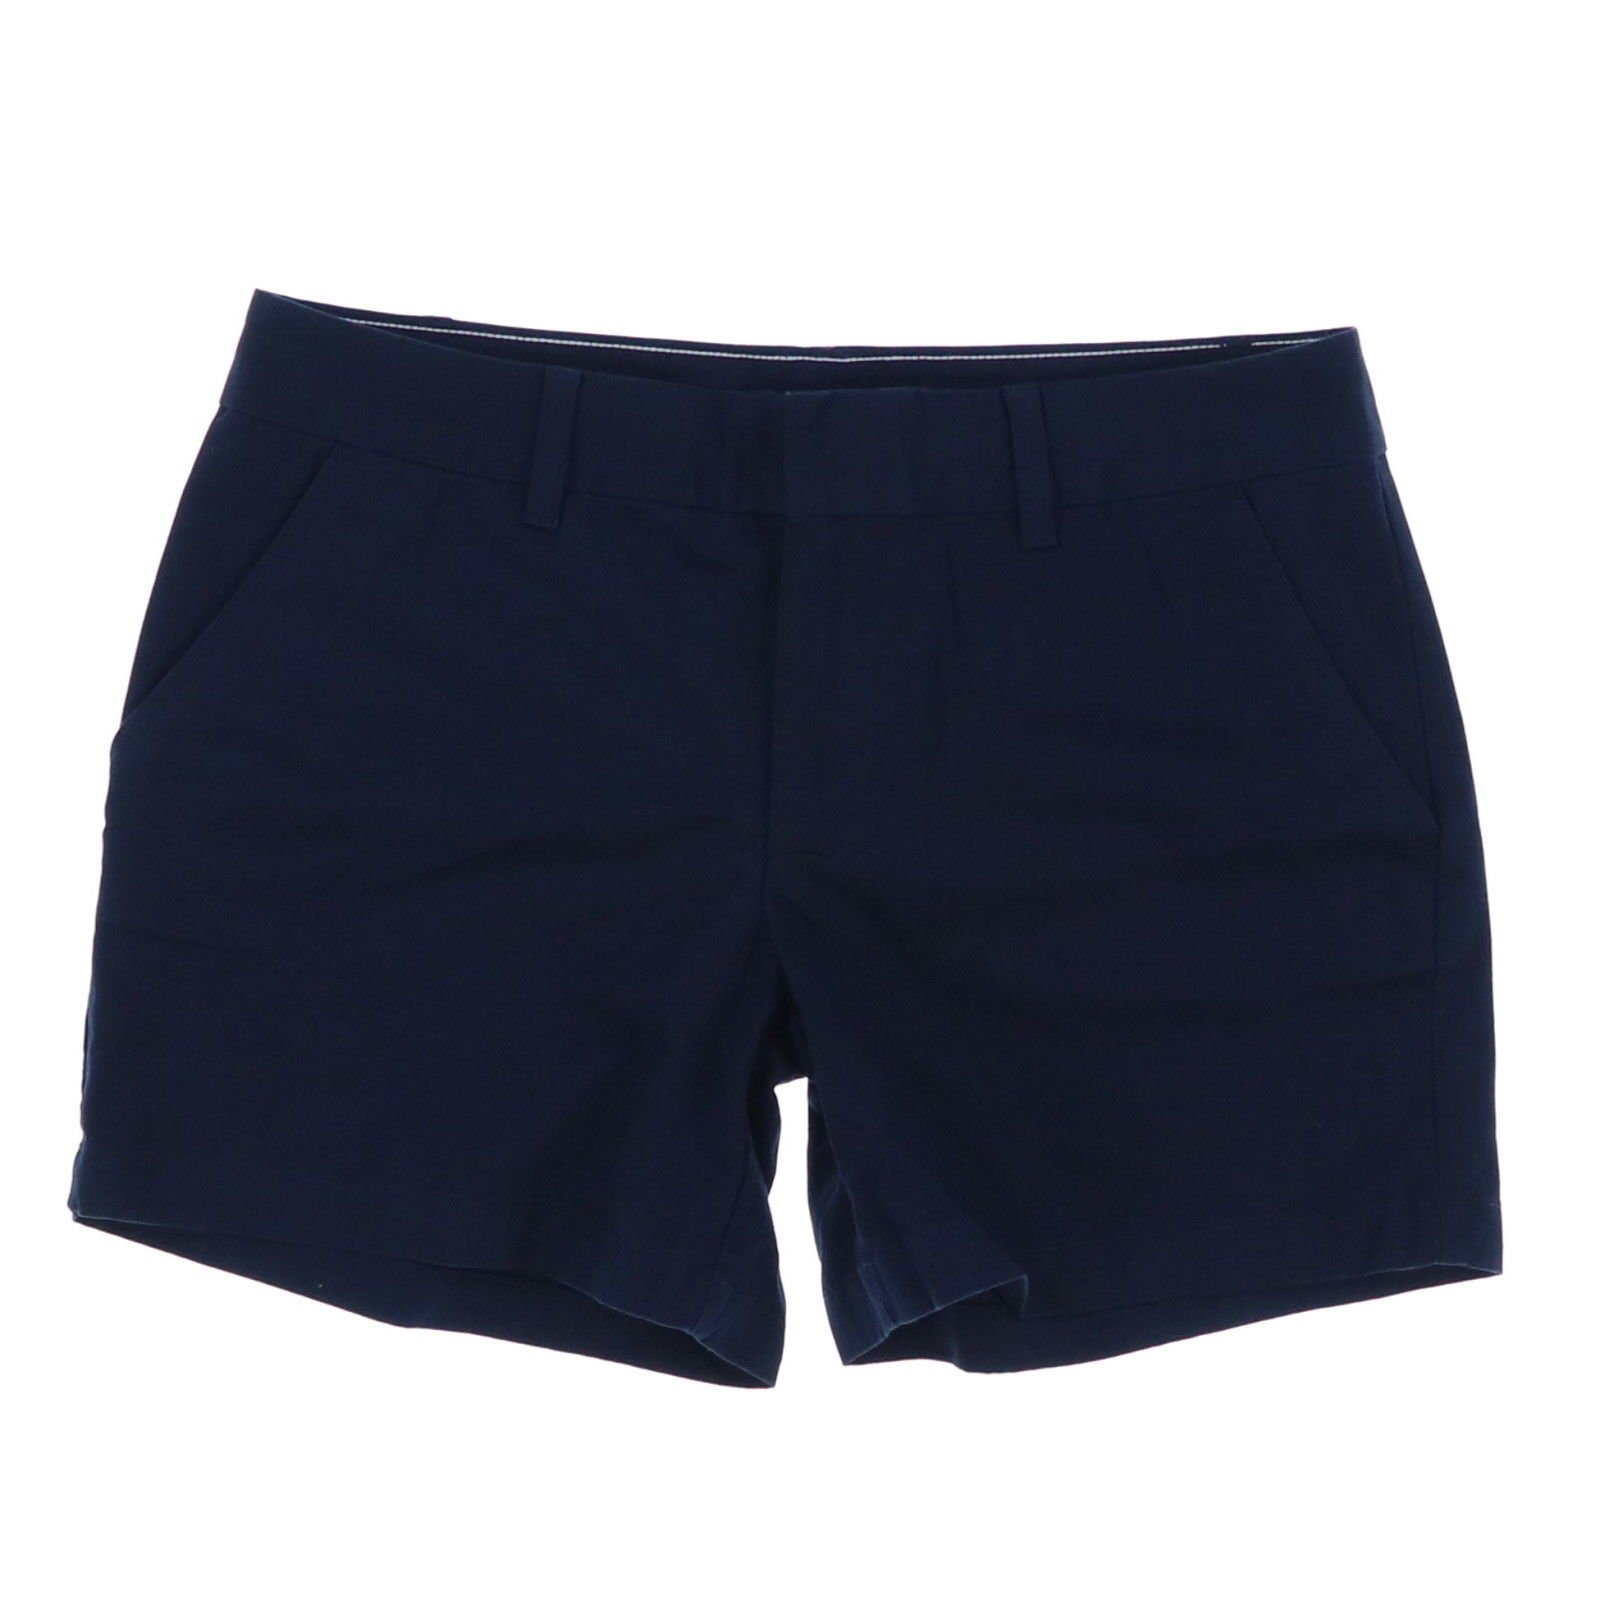 Tommy Hilfiger Womens Twill Chino Shorts, Navy, Size 8